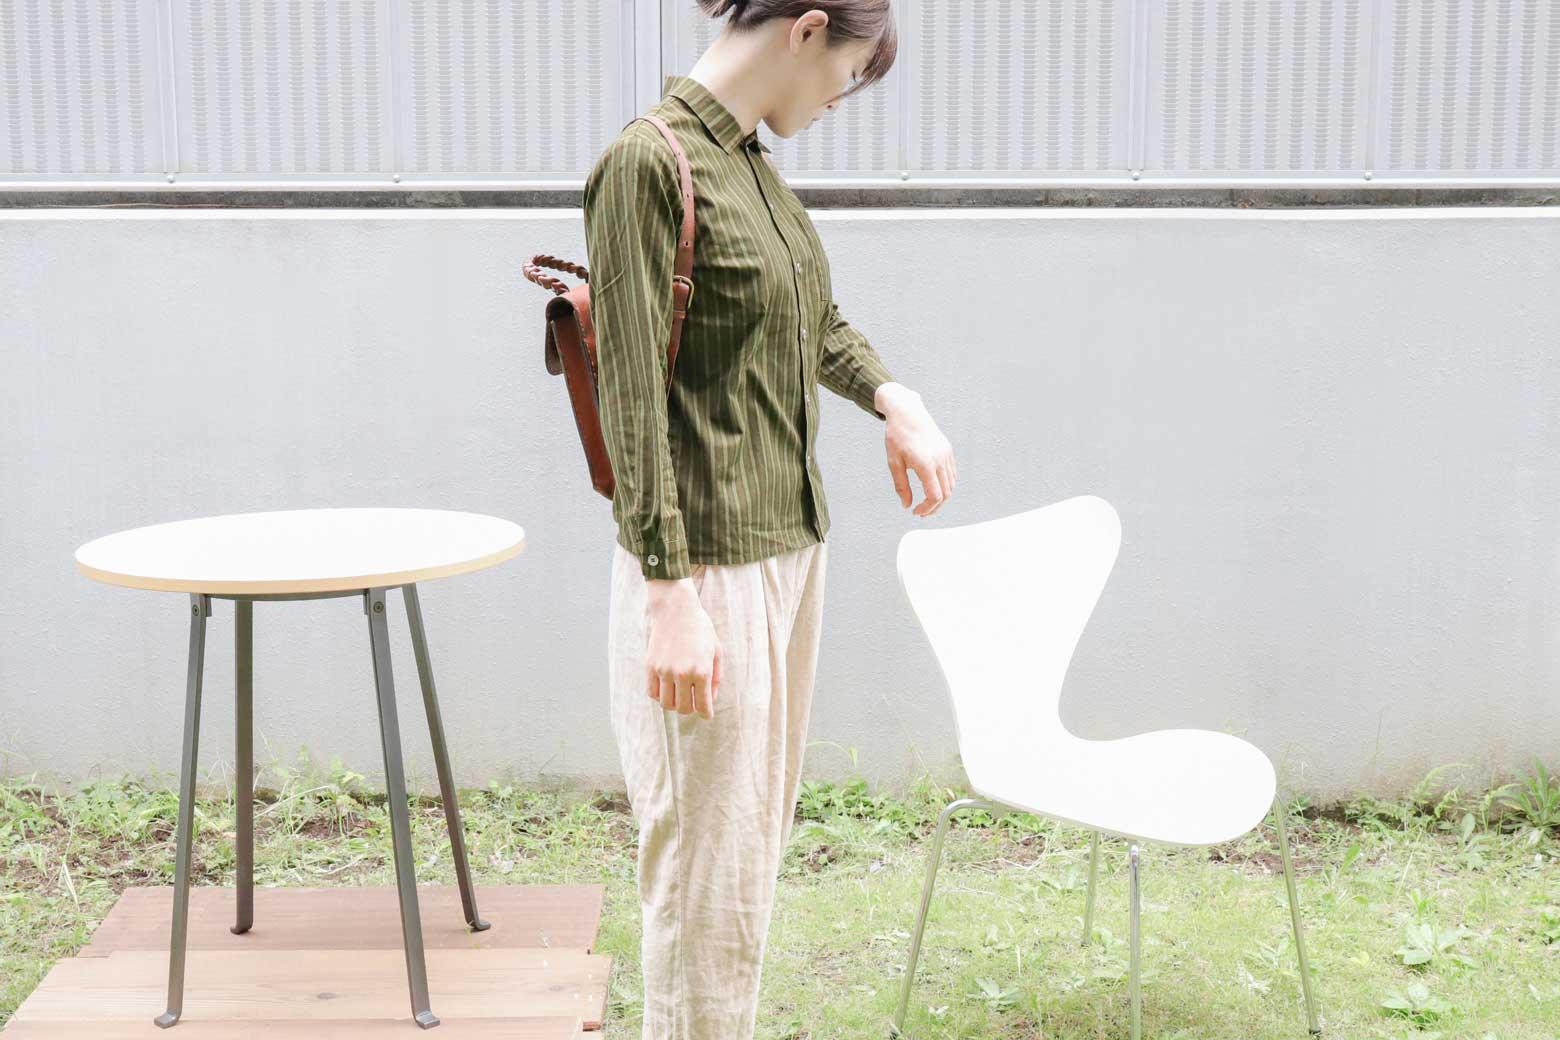 marimekko Piccolo JOKAPOIKA khaki 140size/マリメッコ ピッコロ ヨカポイカ カーキ 140サイズ